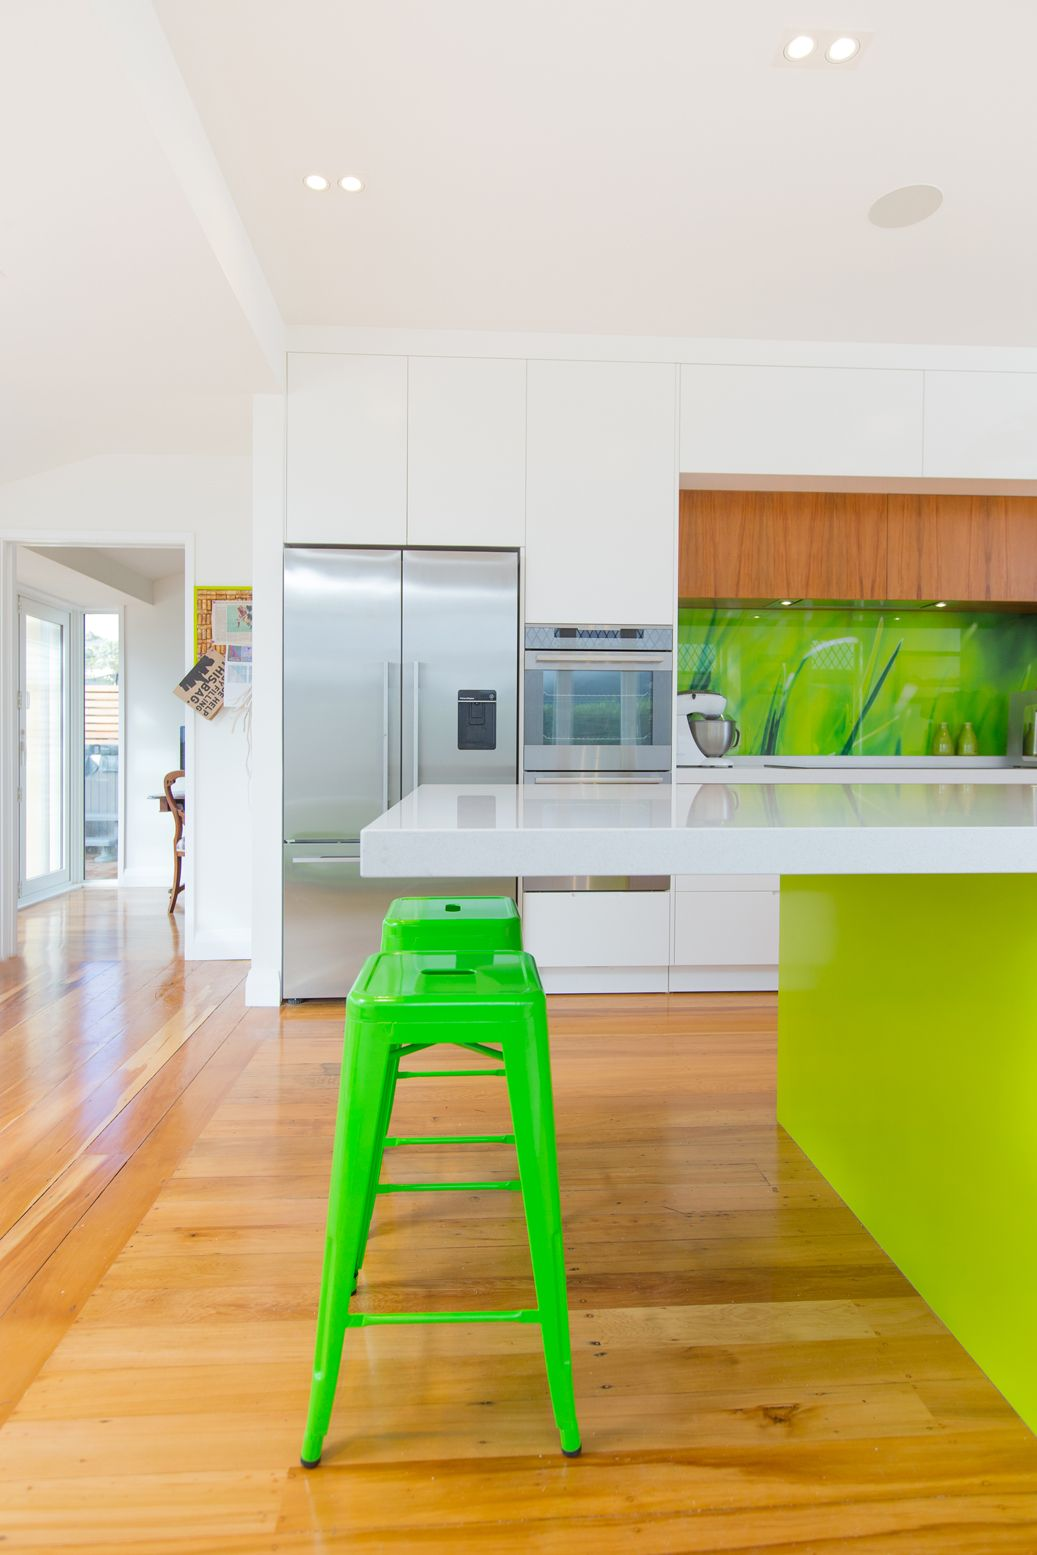 kitchen 451 by sally steer design wellington nz cantilevered